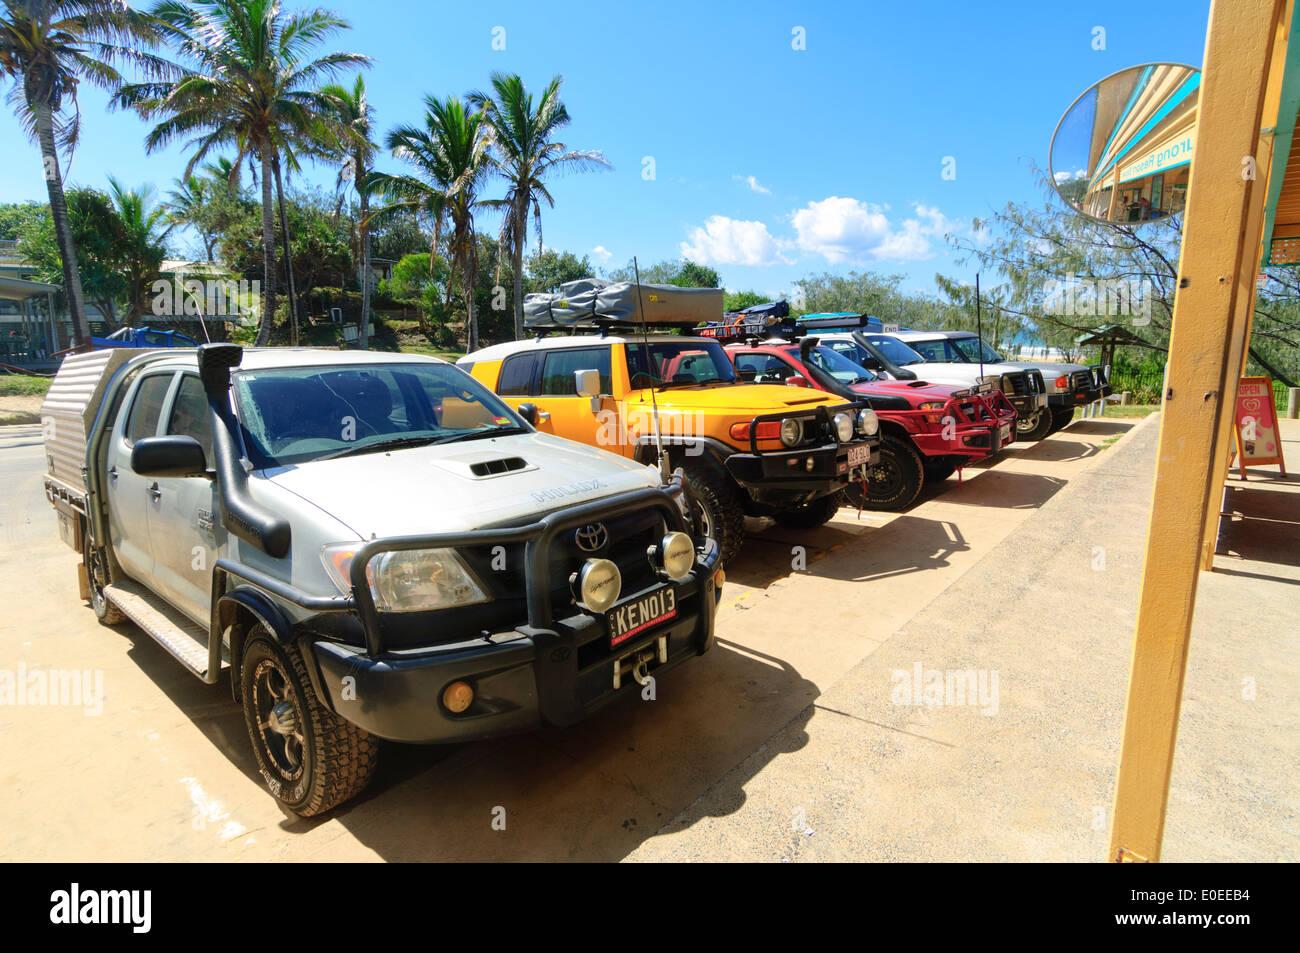 Eurong, Eastern Beach, Fraser Island, Queensland, QLD, Australia - Stock Image